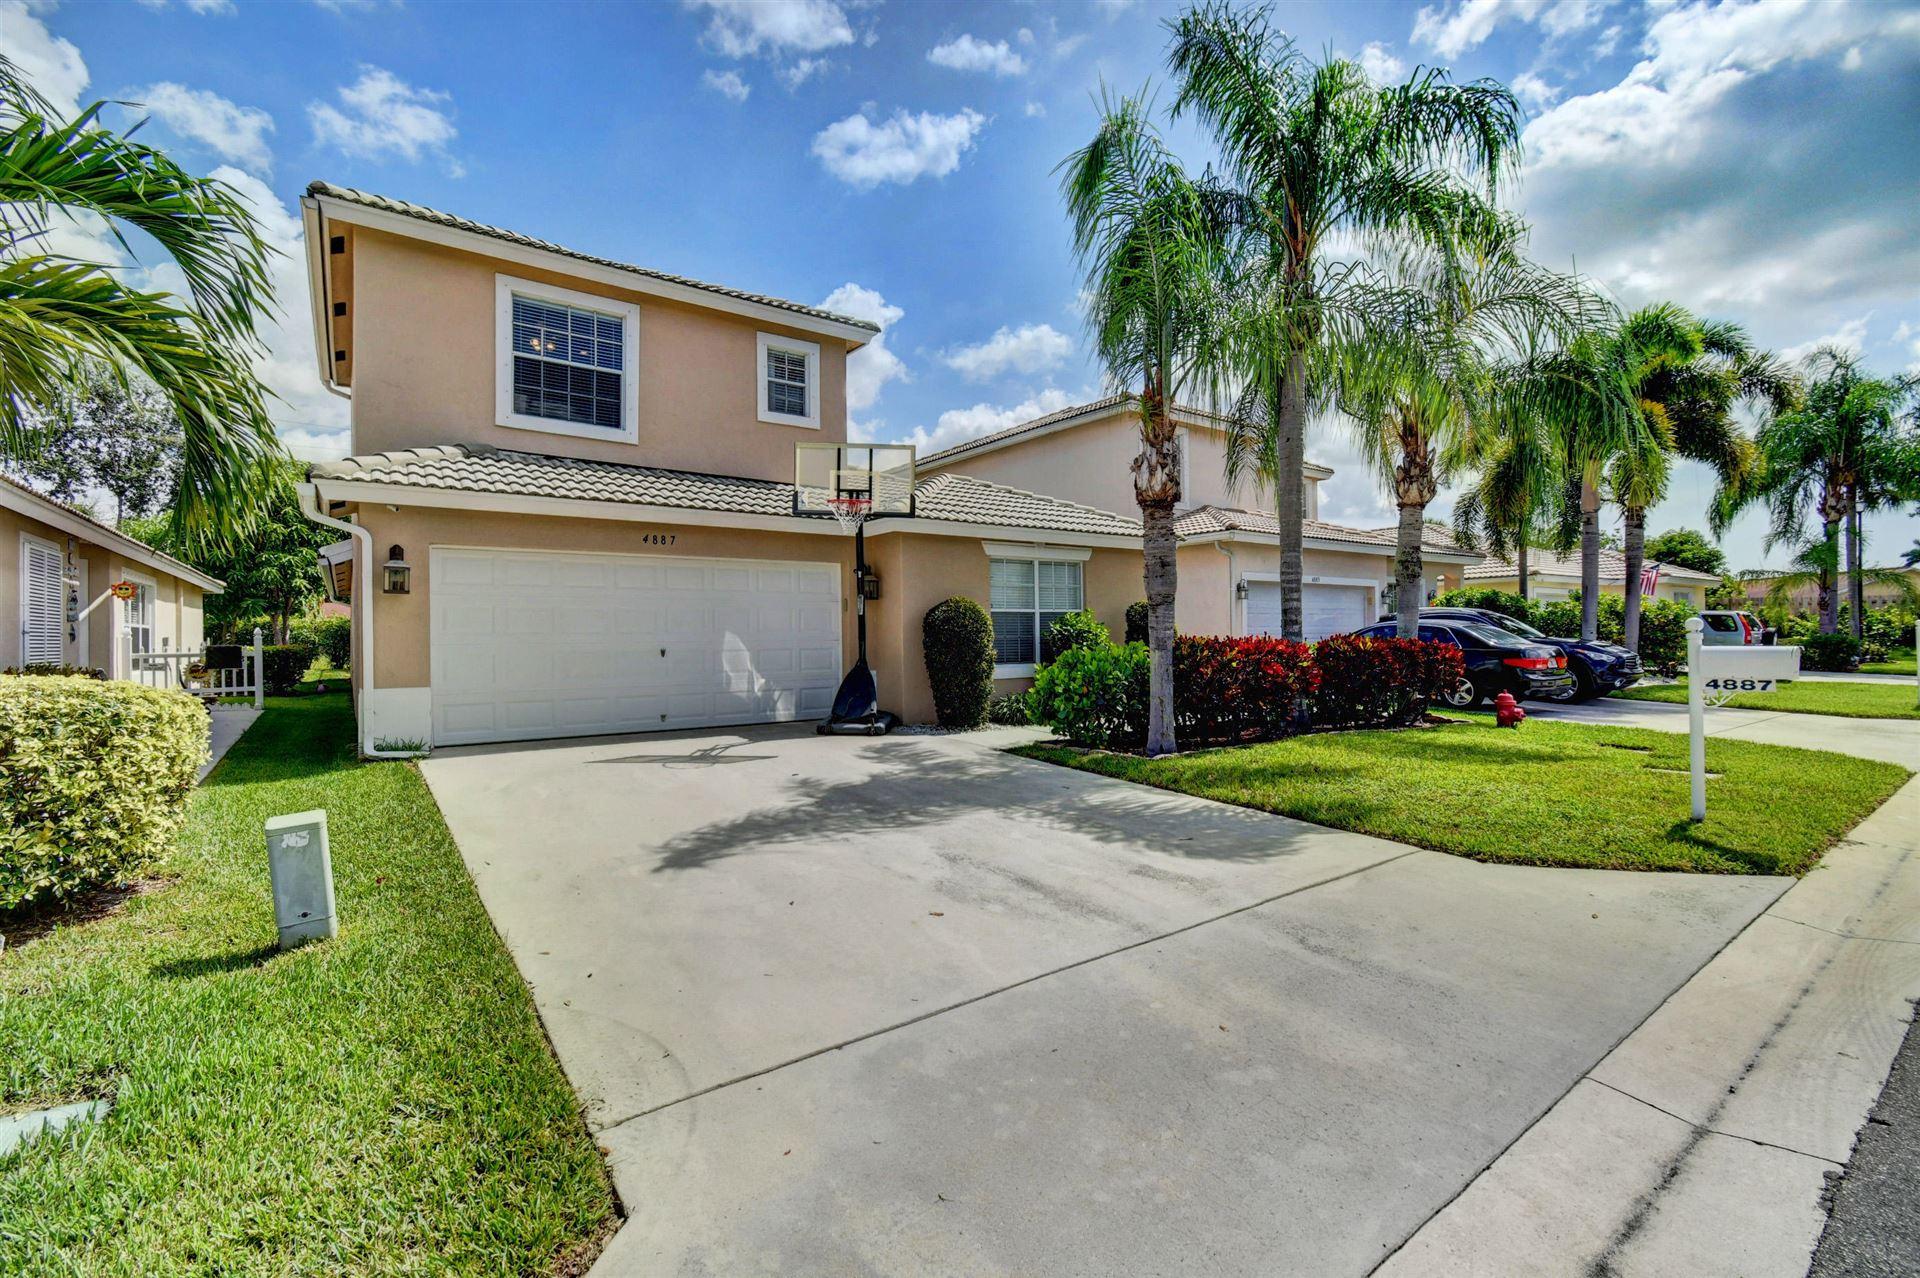 4887 Lombard Pass Drive, Lake Worth, FL 33463 - #: RX-10637606